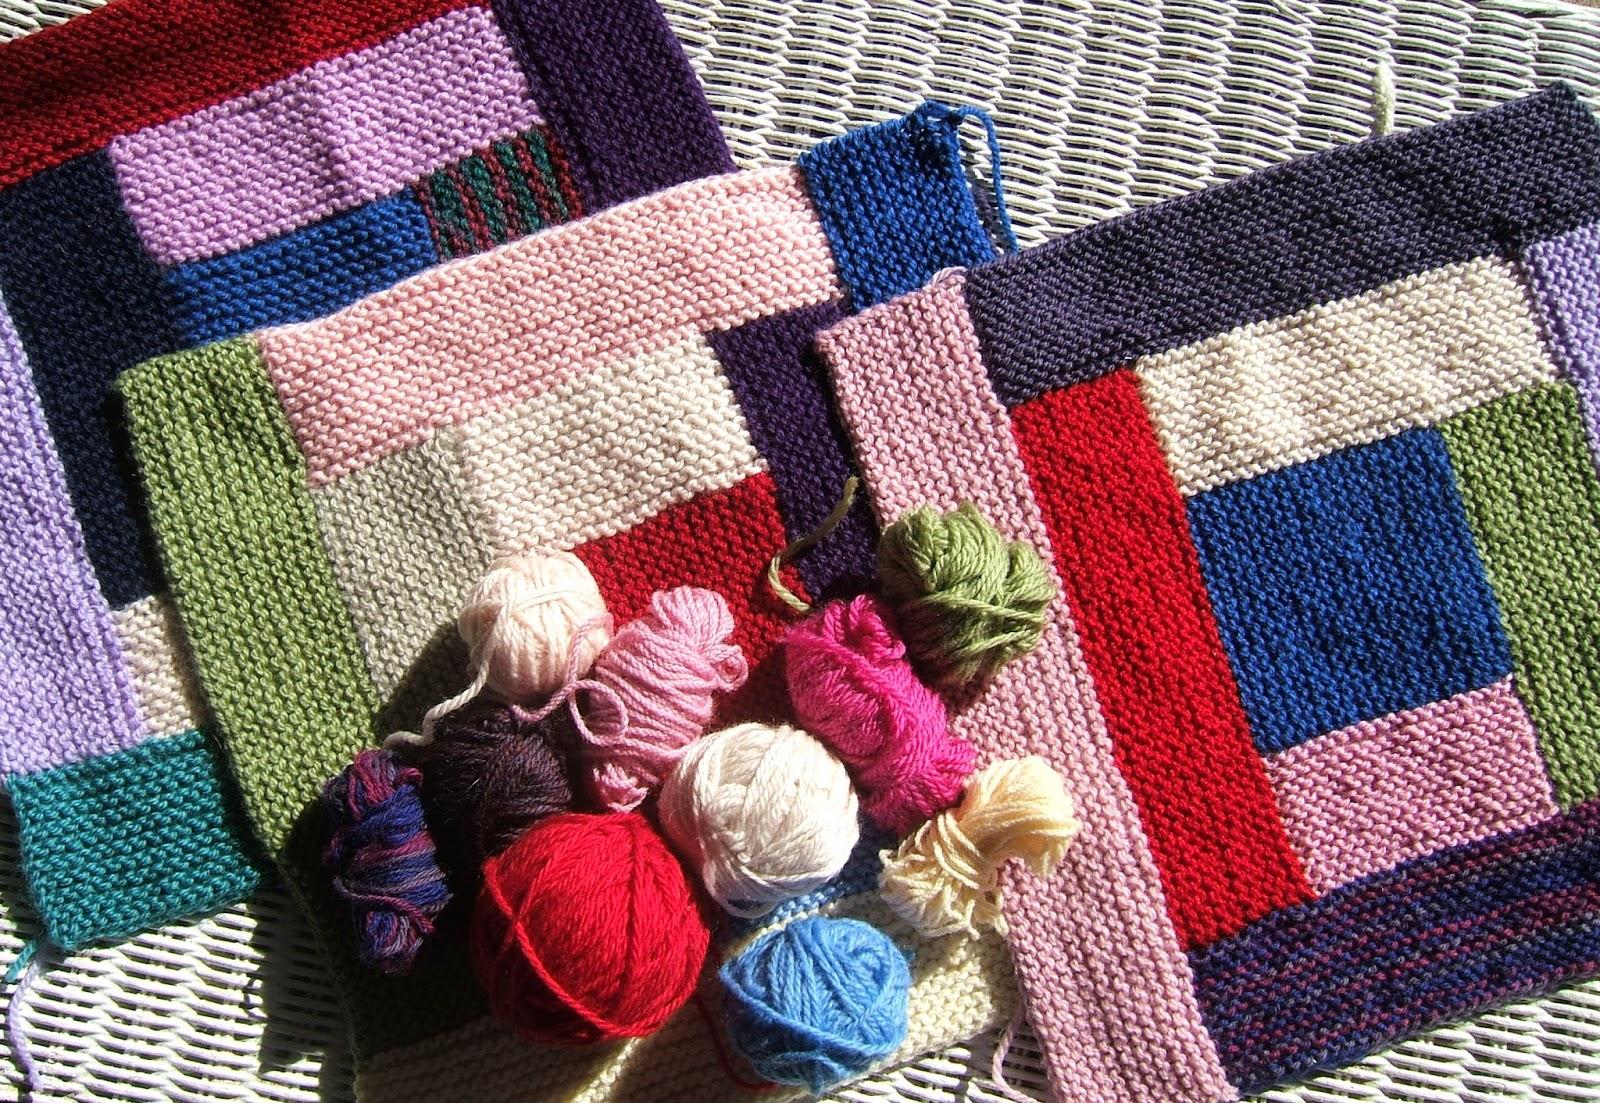 Free Knitting Pattern For Log Cabin Blanket : aussie knitting threads: Log Cabin knitted blanket